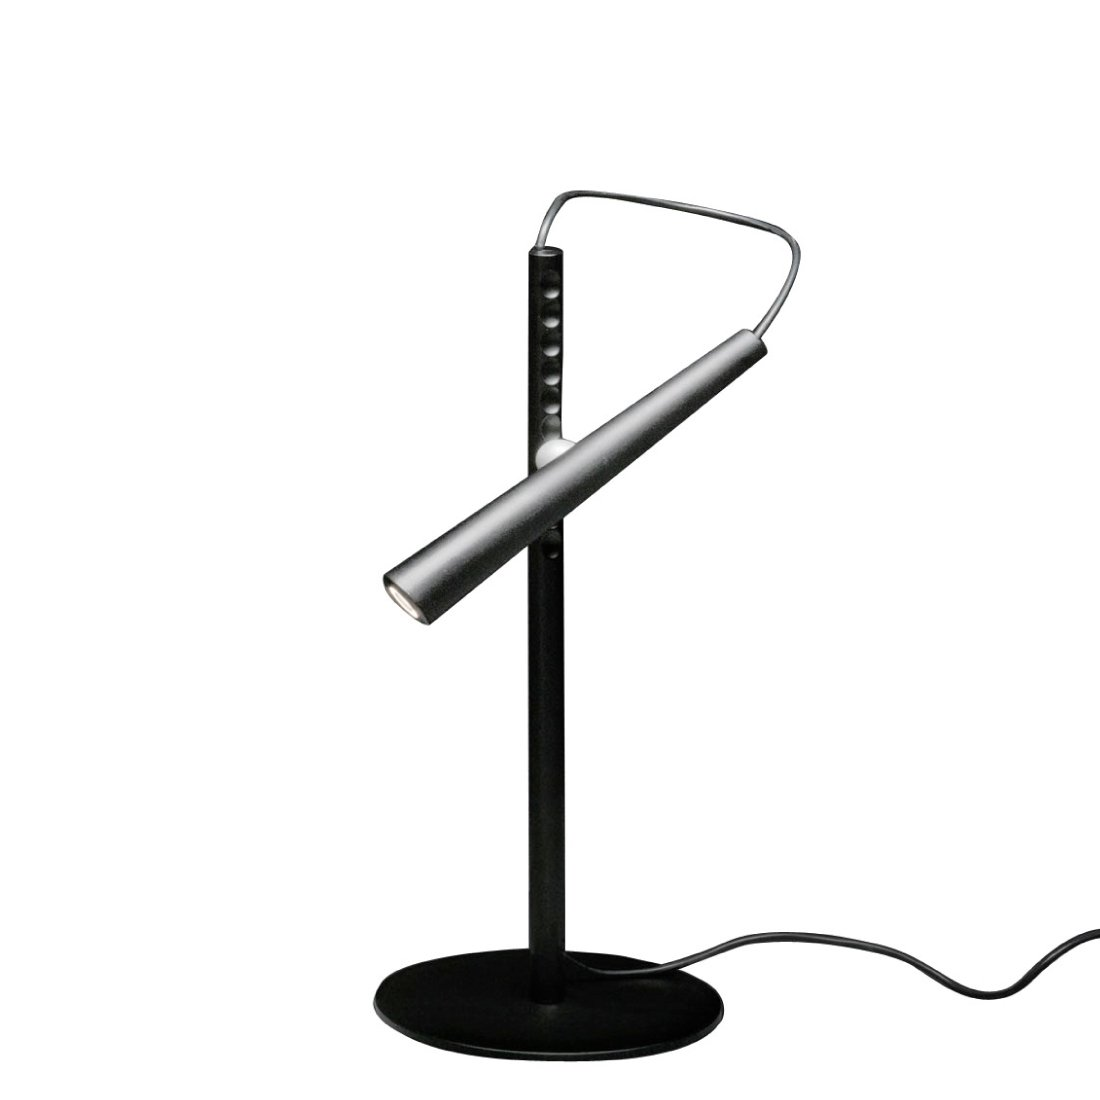 Foscarini Magneto Tafellamp Zwart